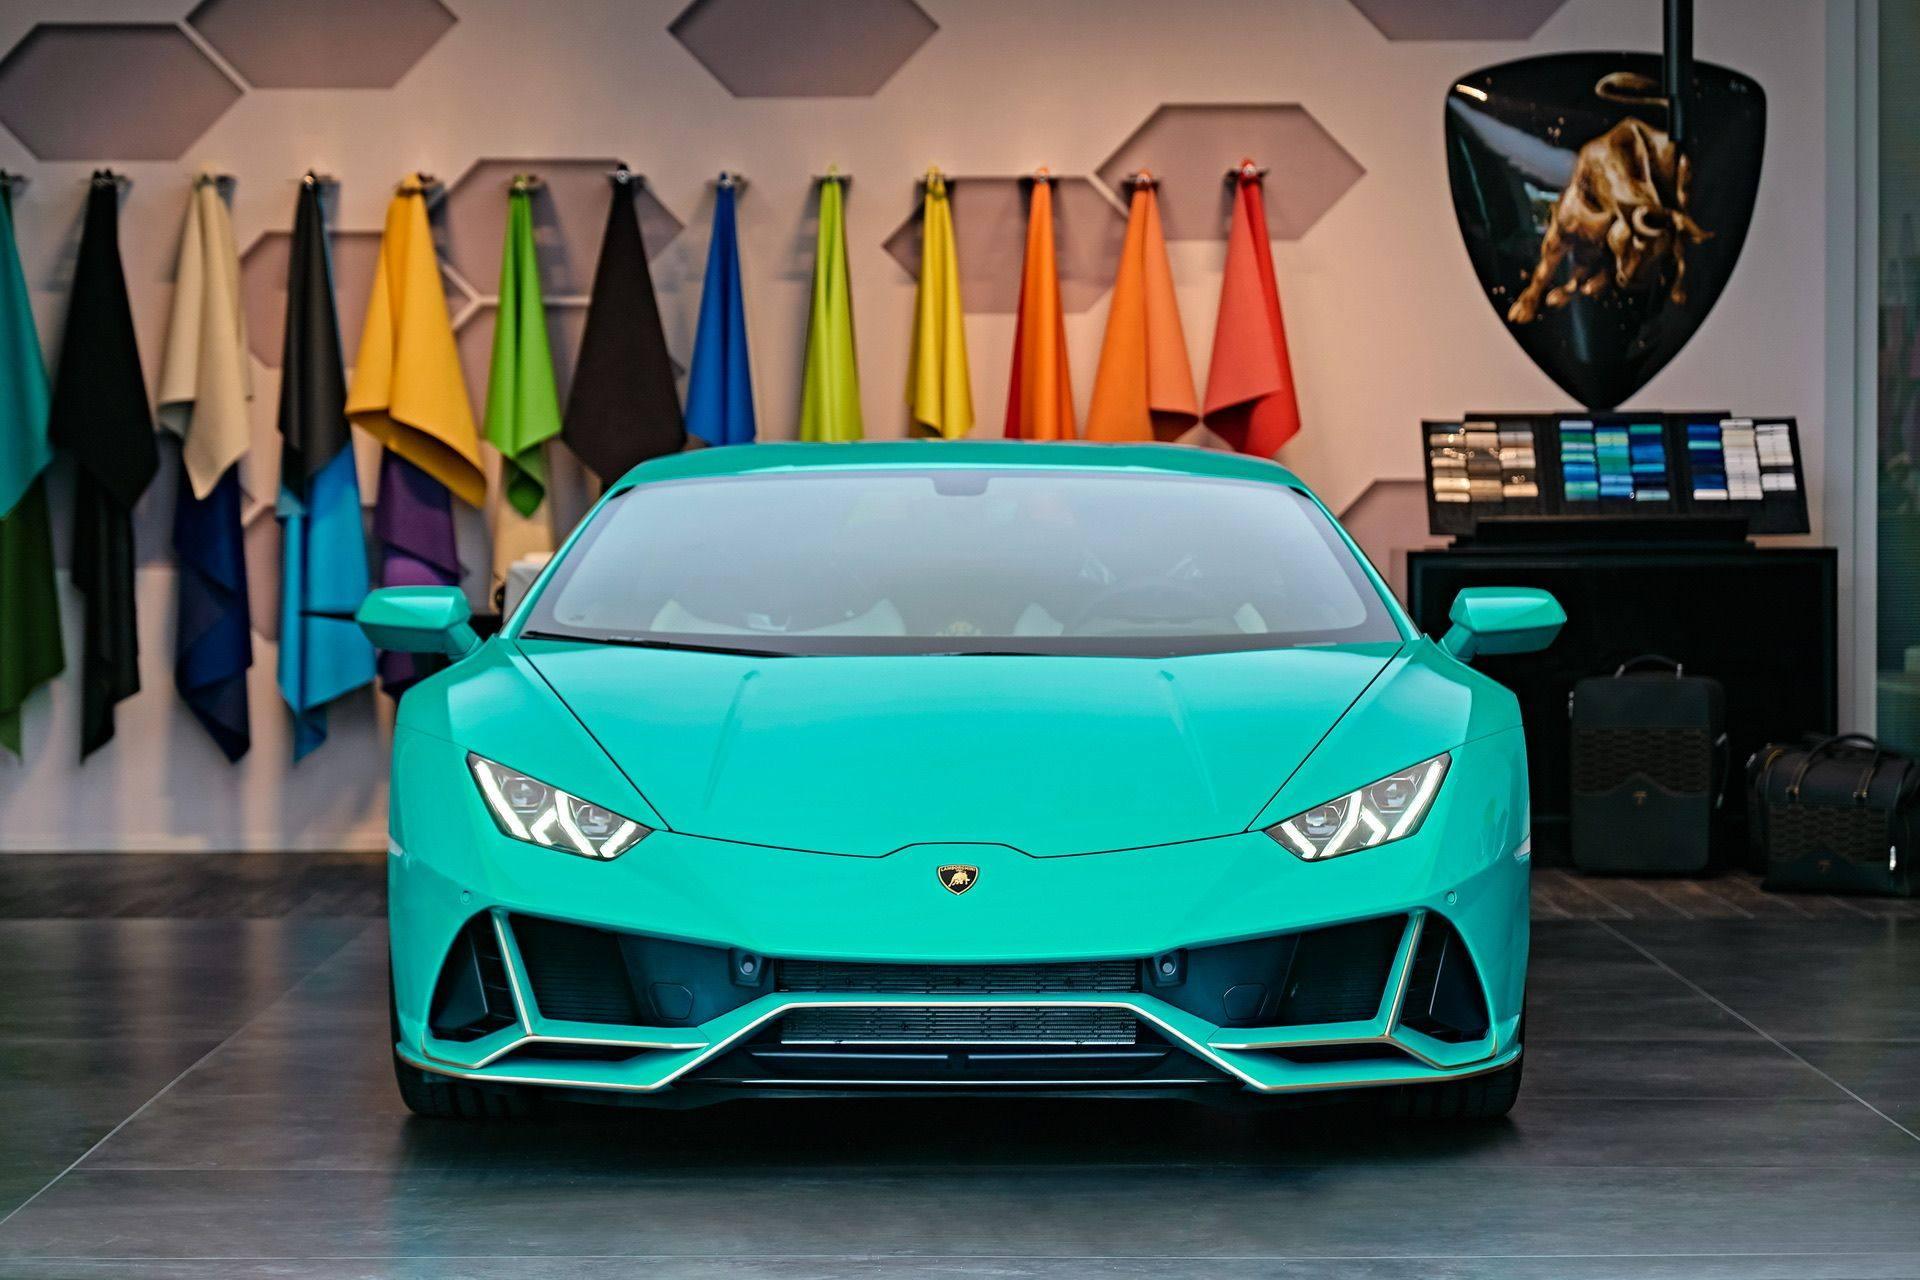 Lamborghini-Huracan-for-Mexico13_1920x1280